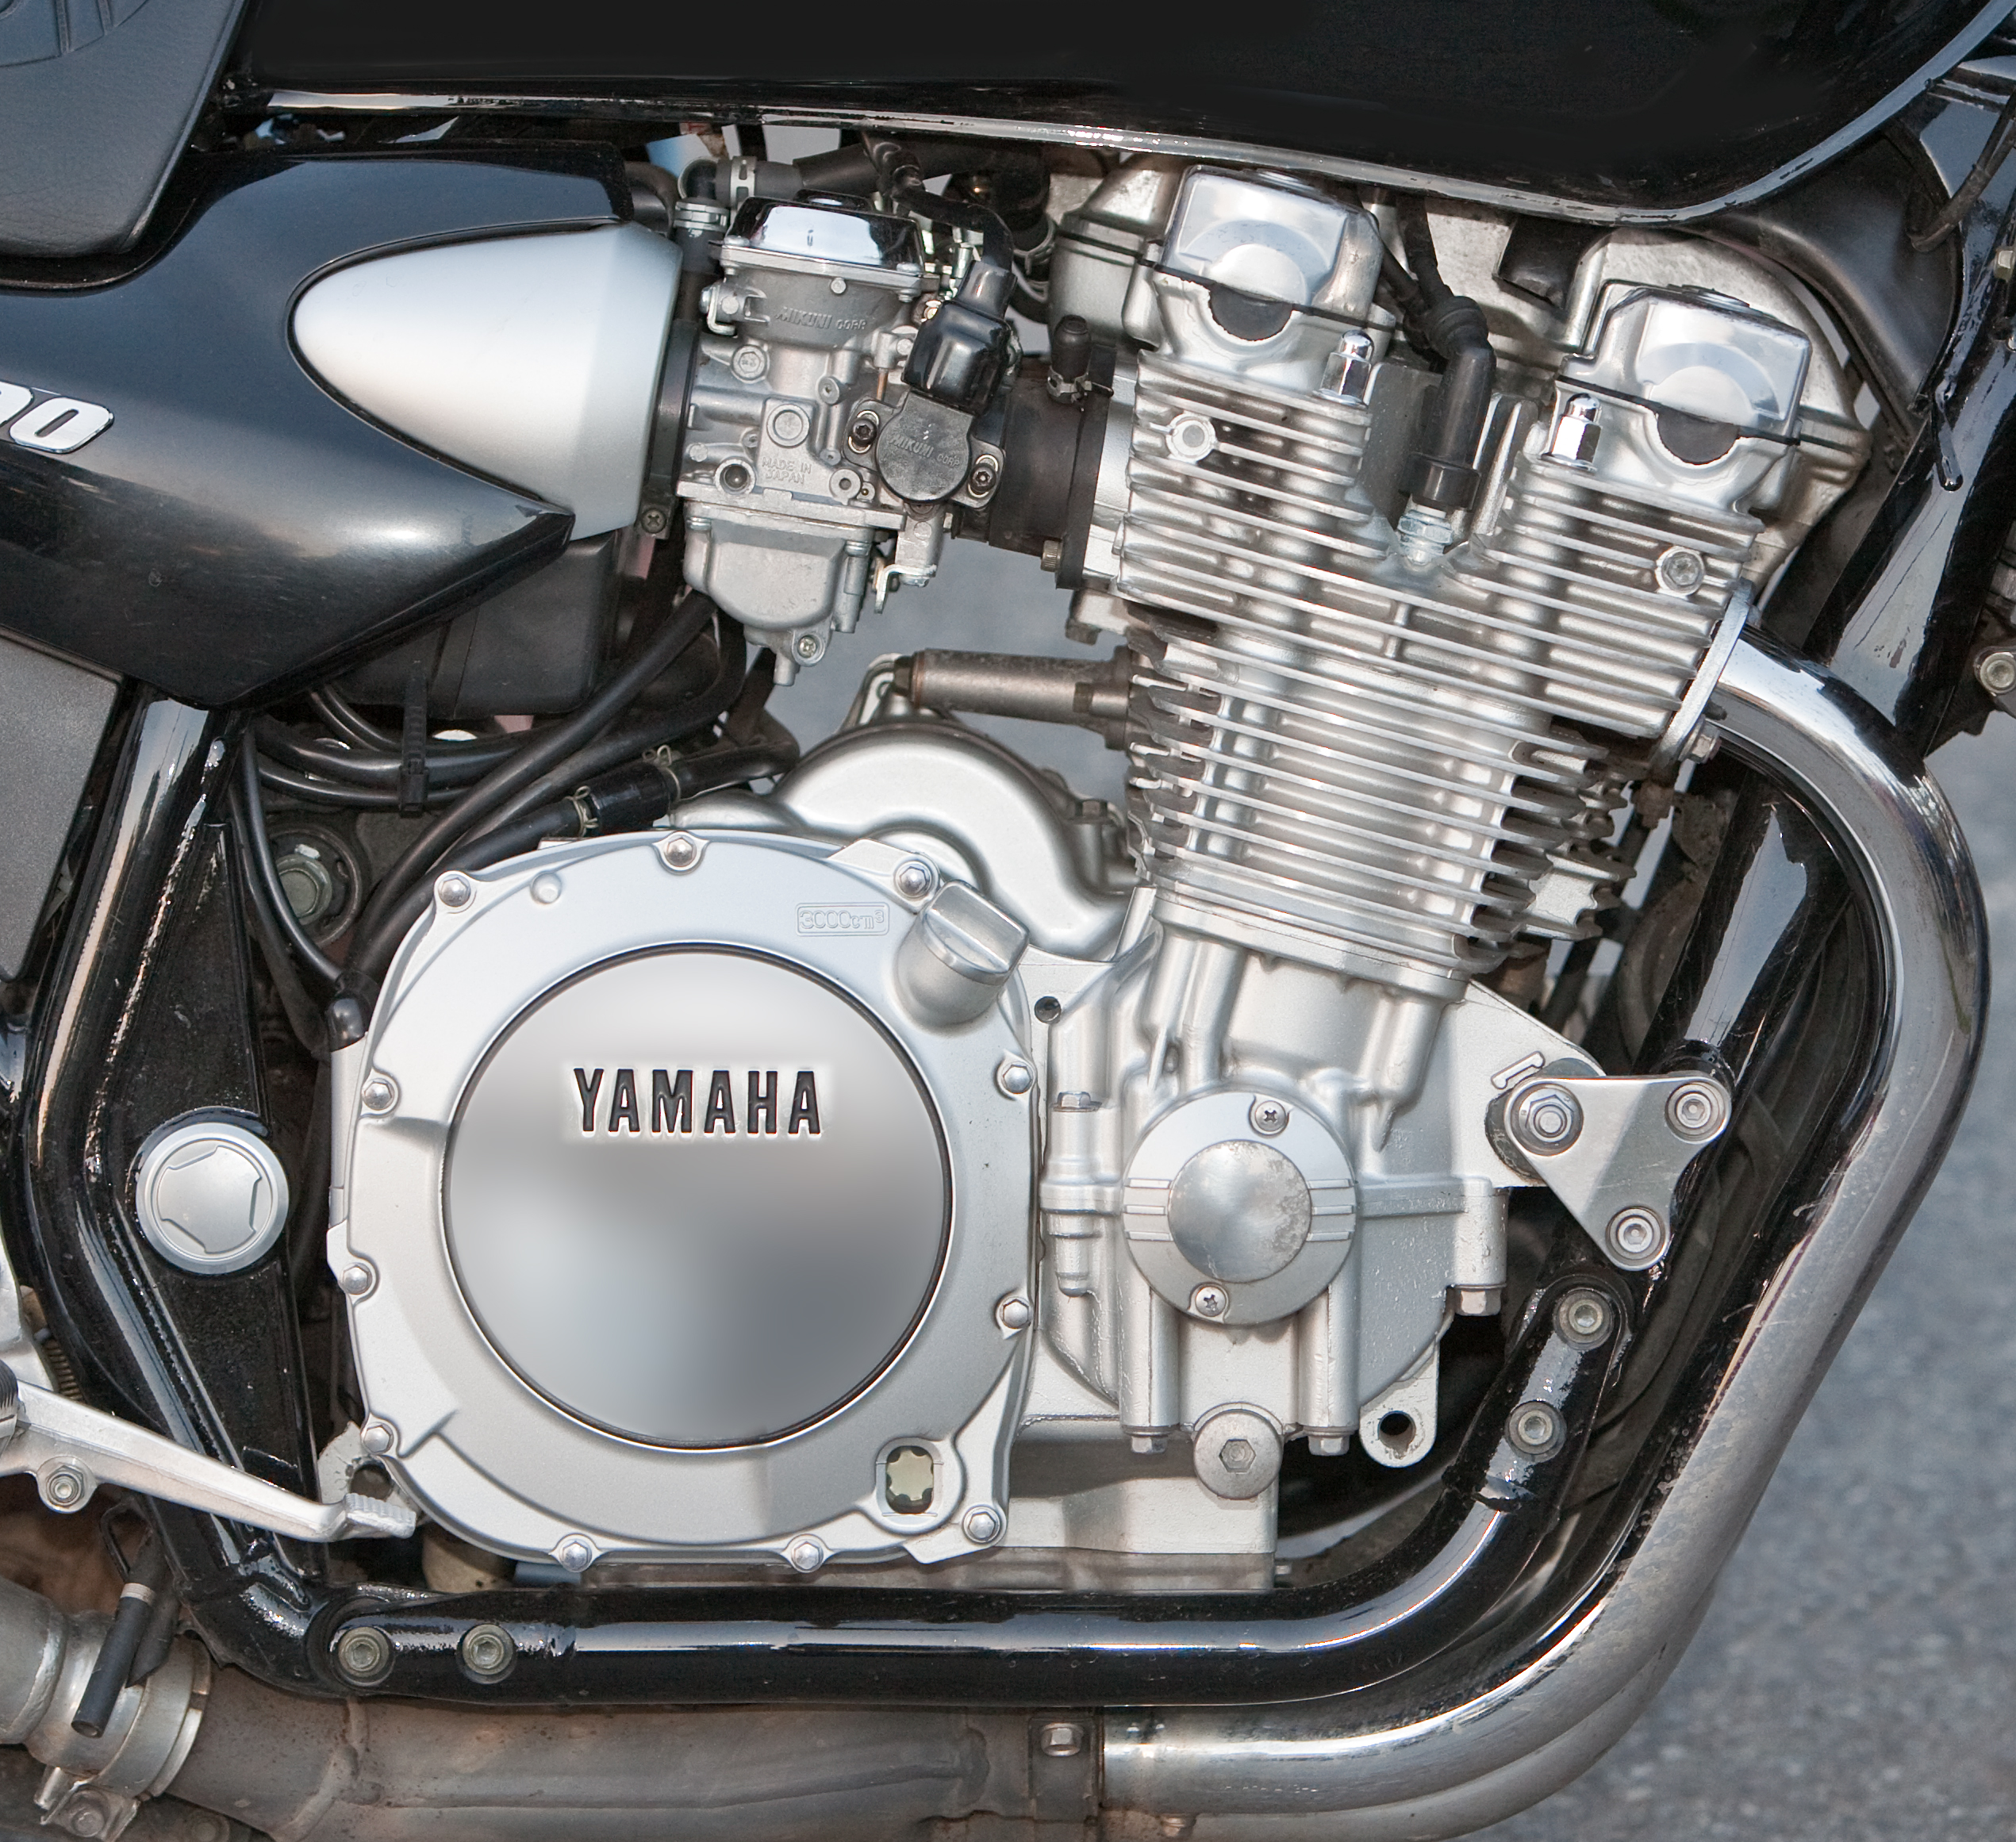 Kawasaki Motorcycle Engines Wiki